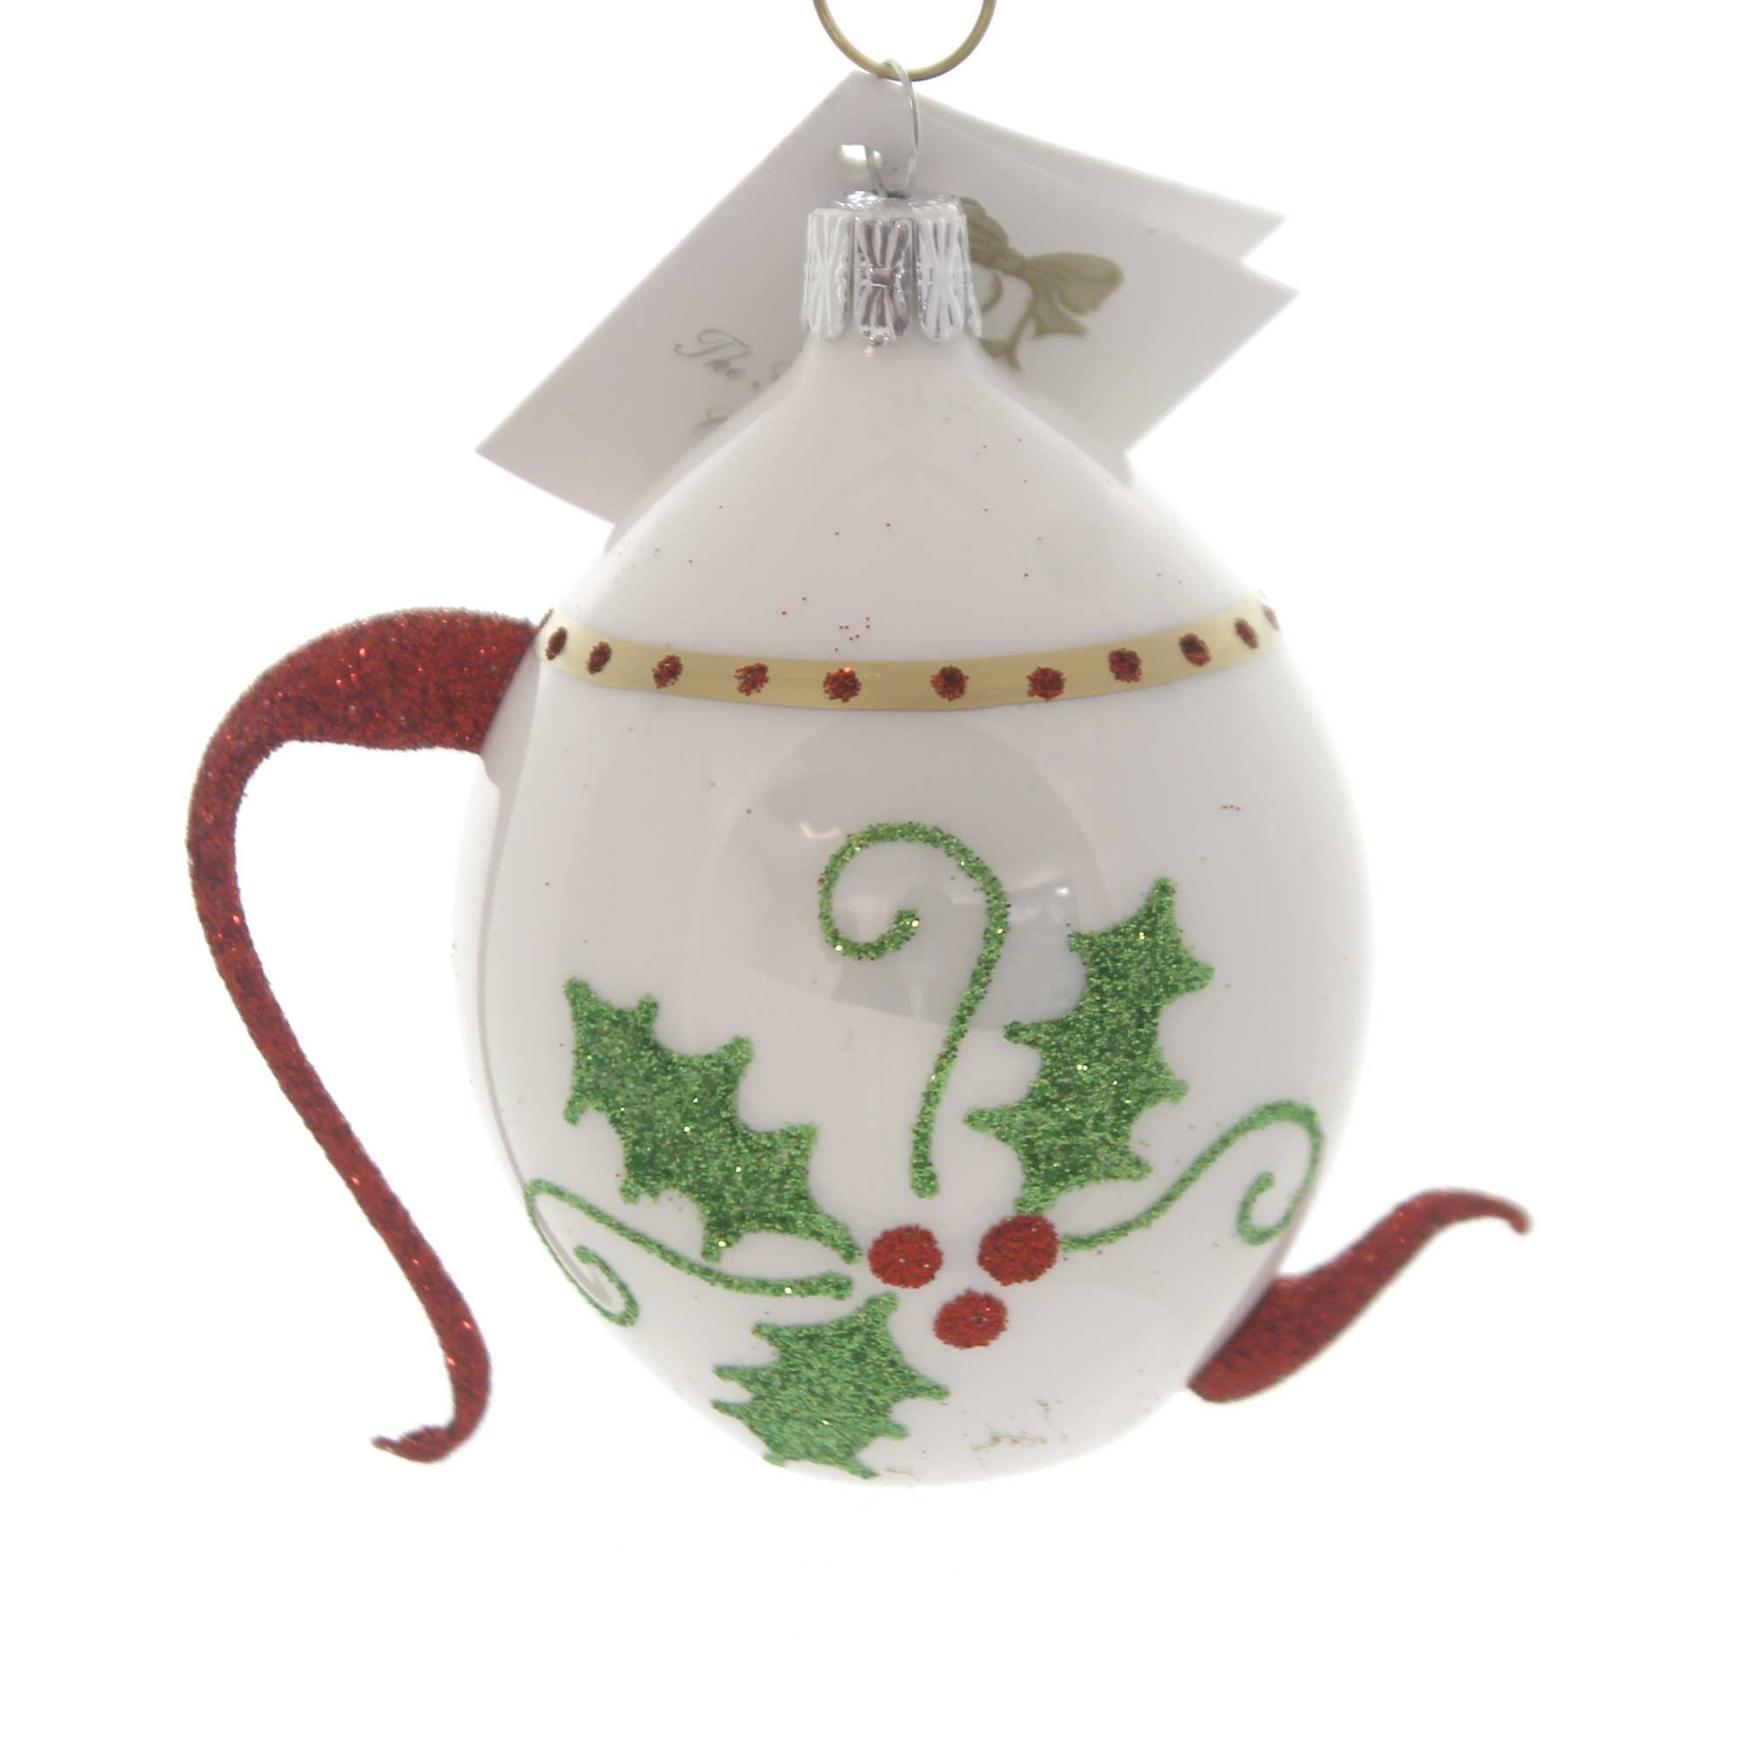 Golden Bell Collection HOLLY TEAPOT Glass Ornament Czech Hospitality Nv905